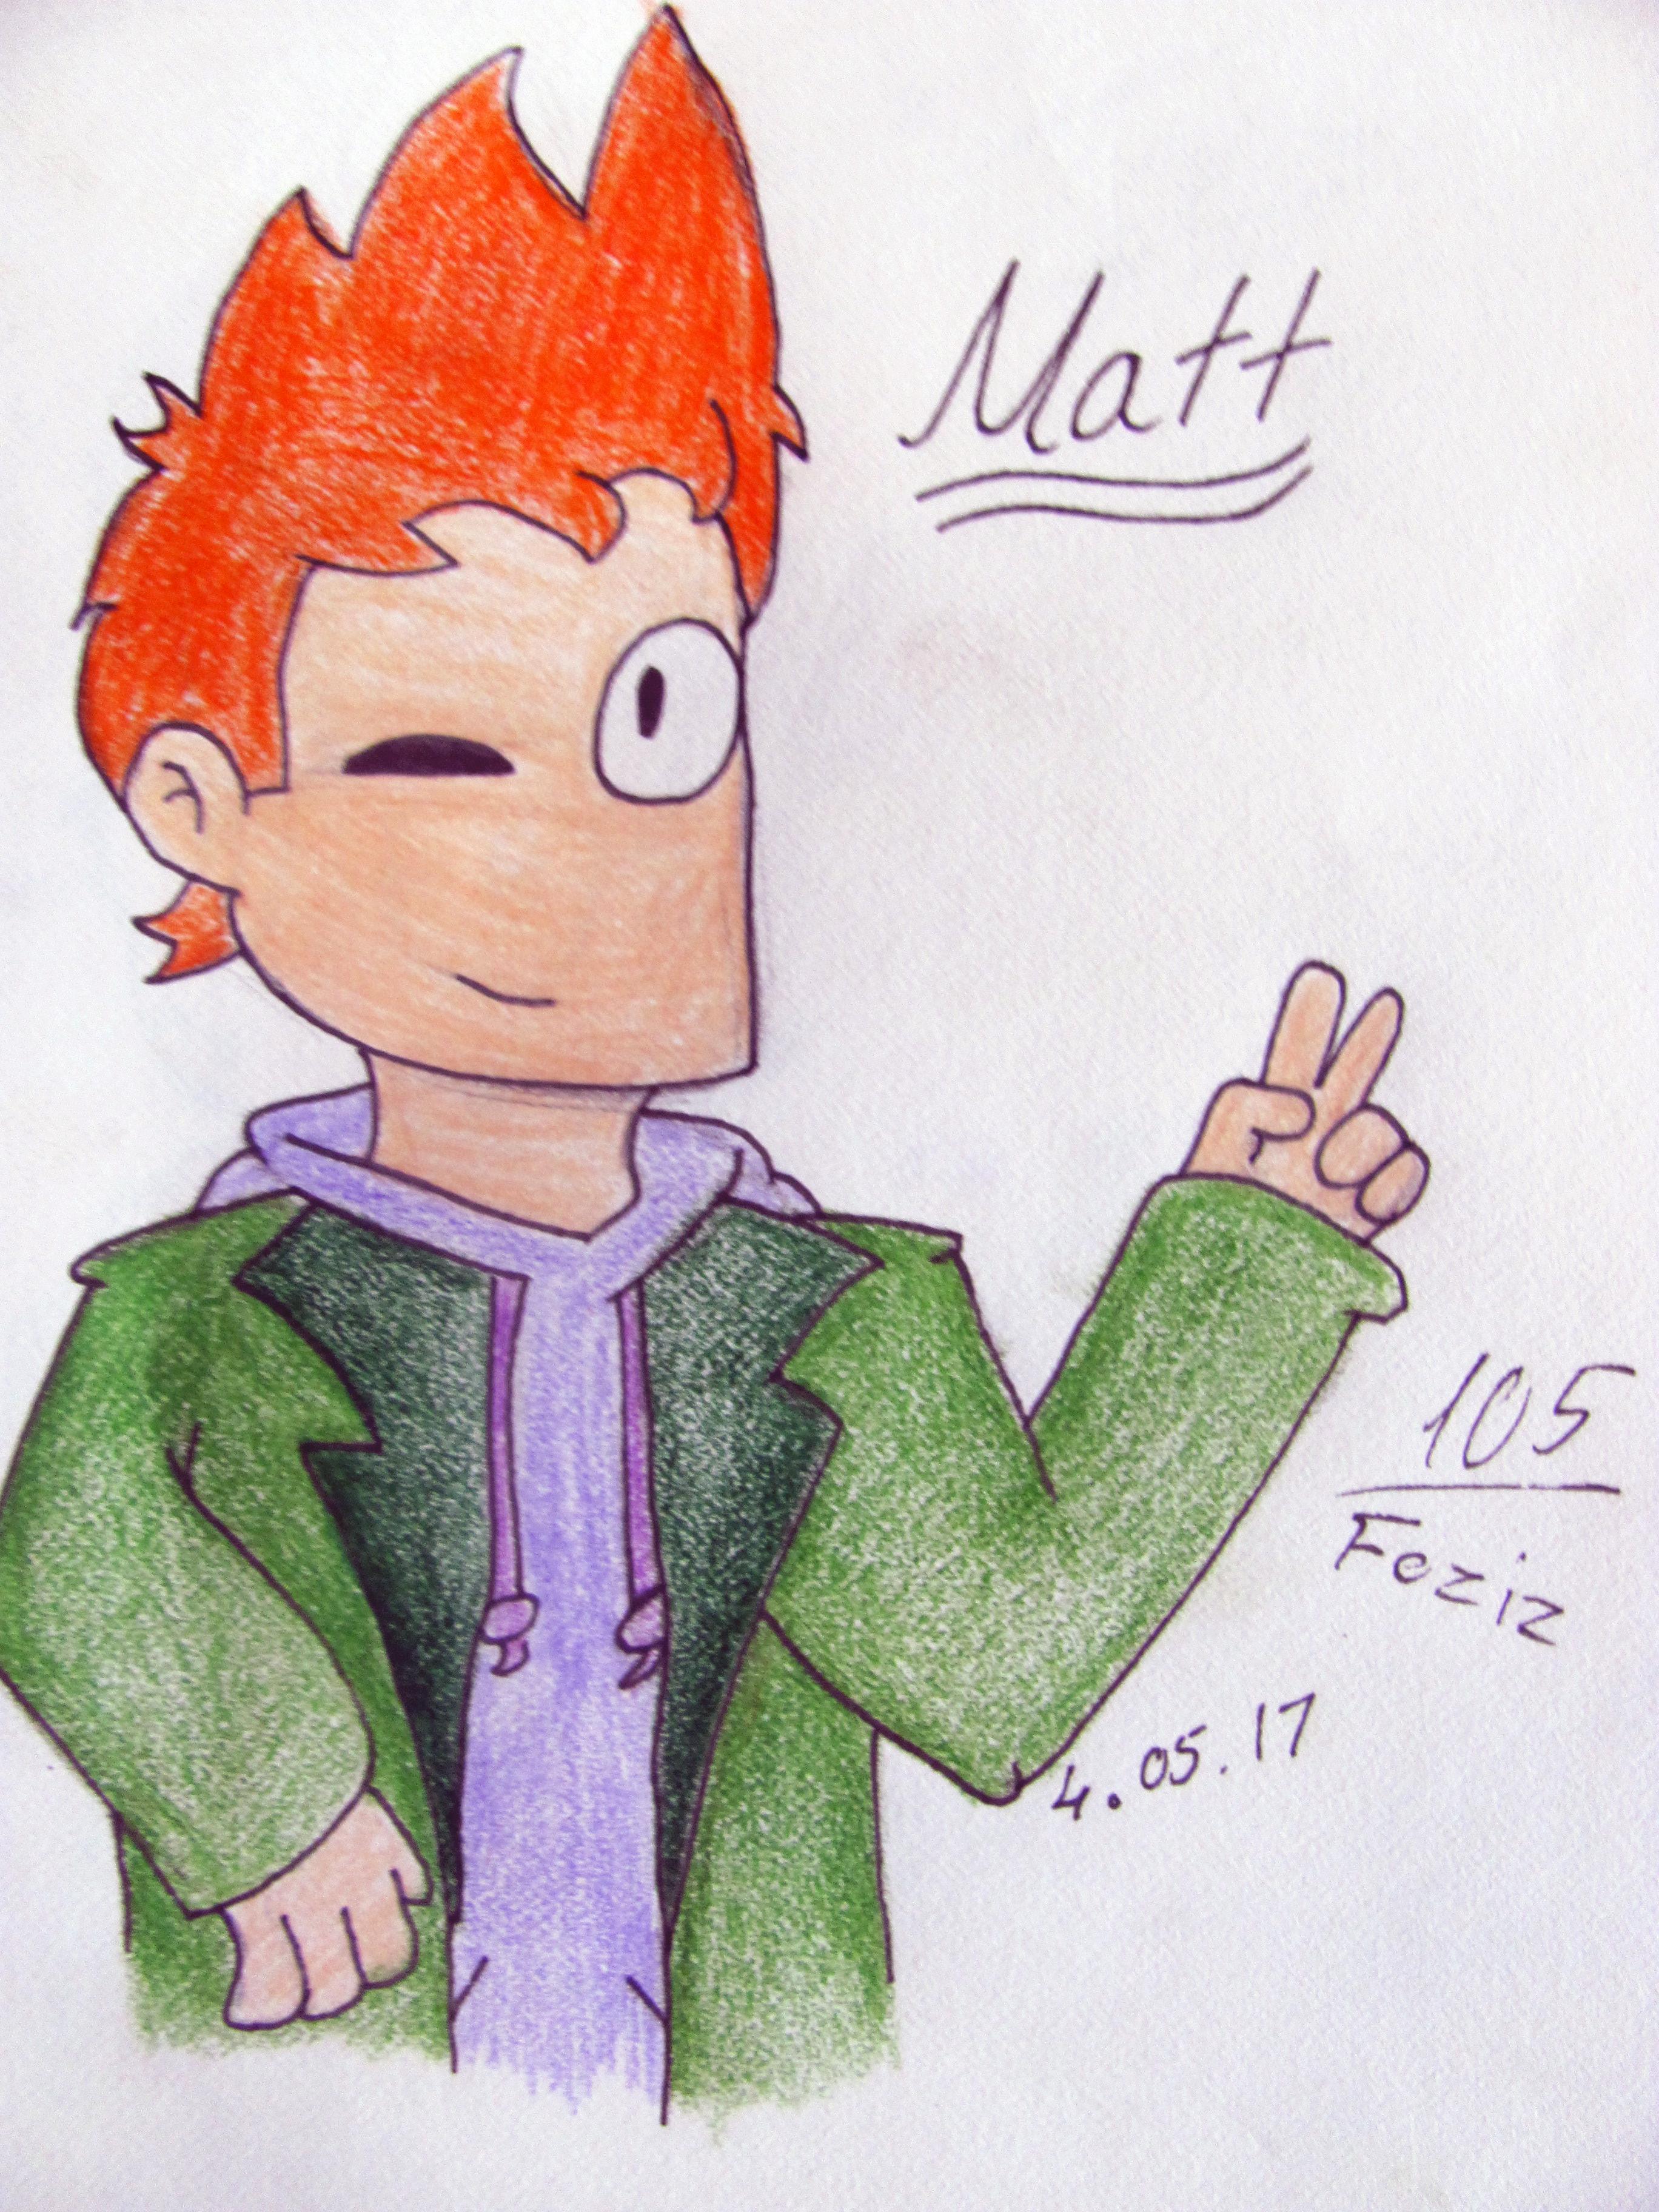 Matt [Eddsworld Fanart] by Foziz105